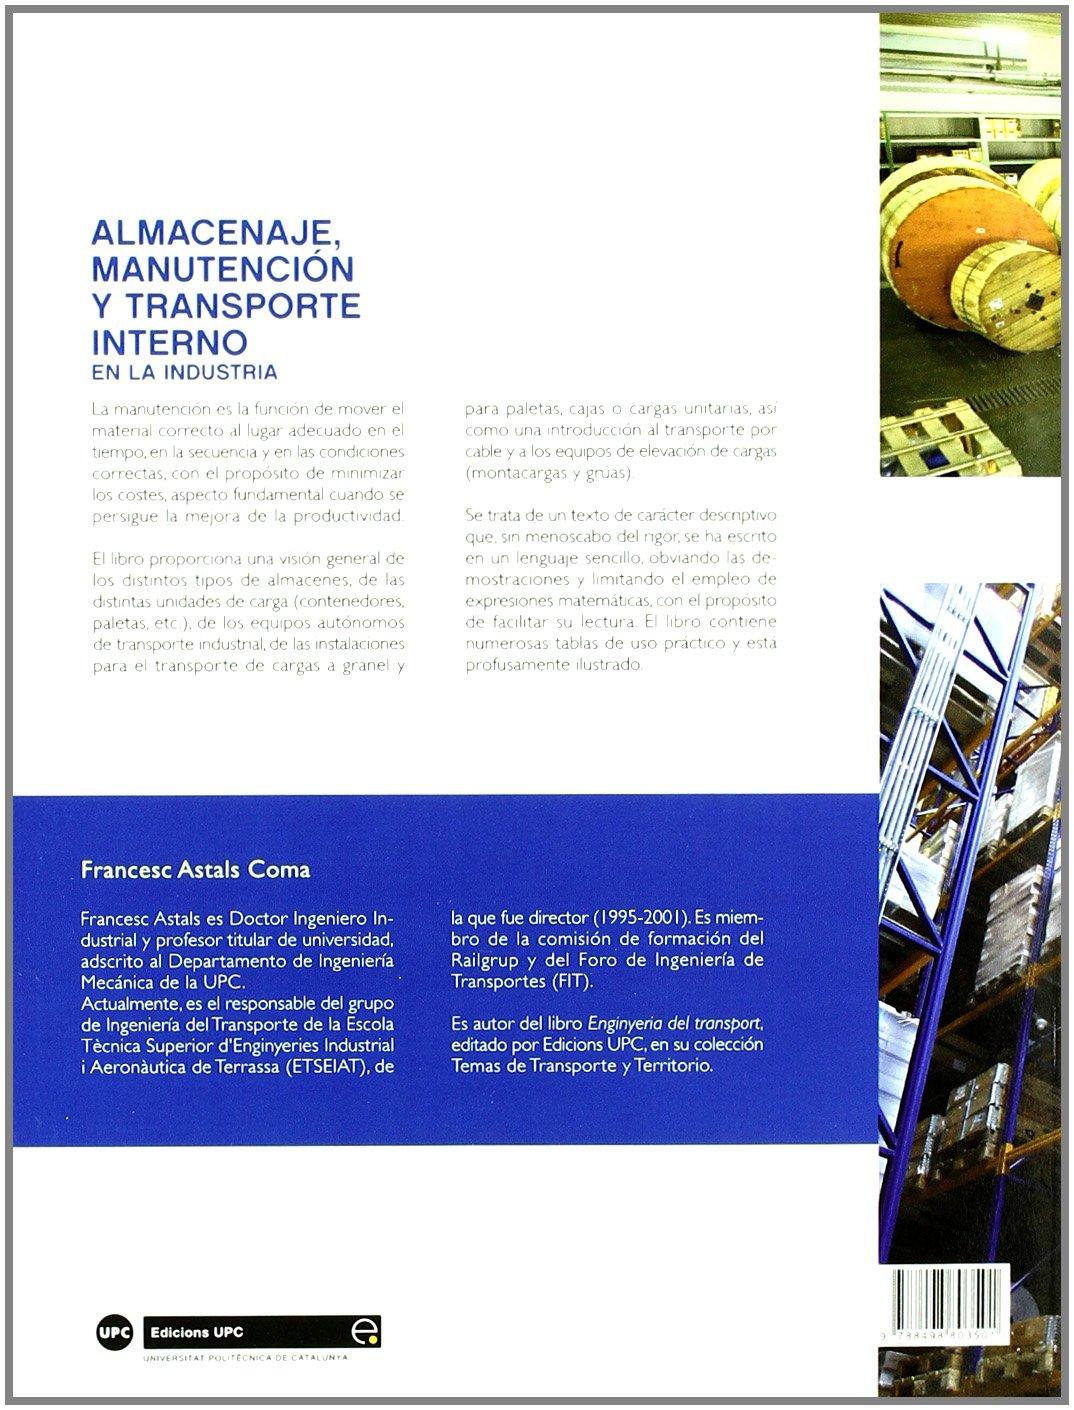 Almacenaje, Manutencin y Trasporte Interno En La Industria (Spanish Edition): Francesc Astals Coma, Upc Edicions Upc: 9788498803501: Amazon.com: Books